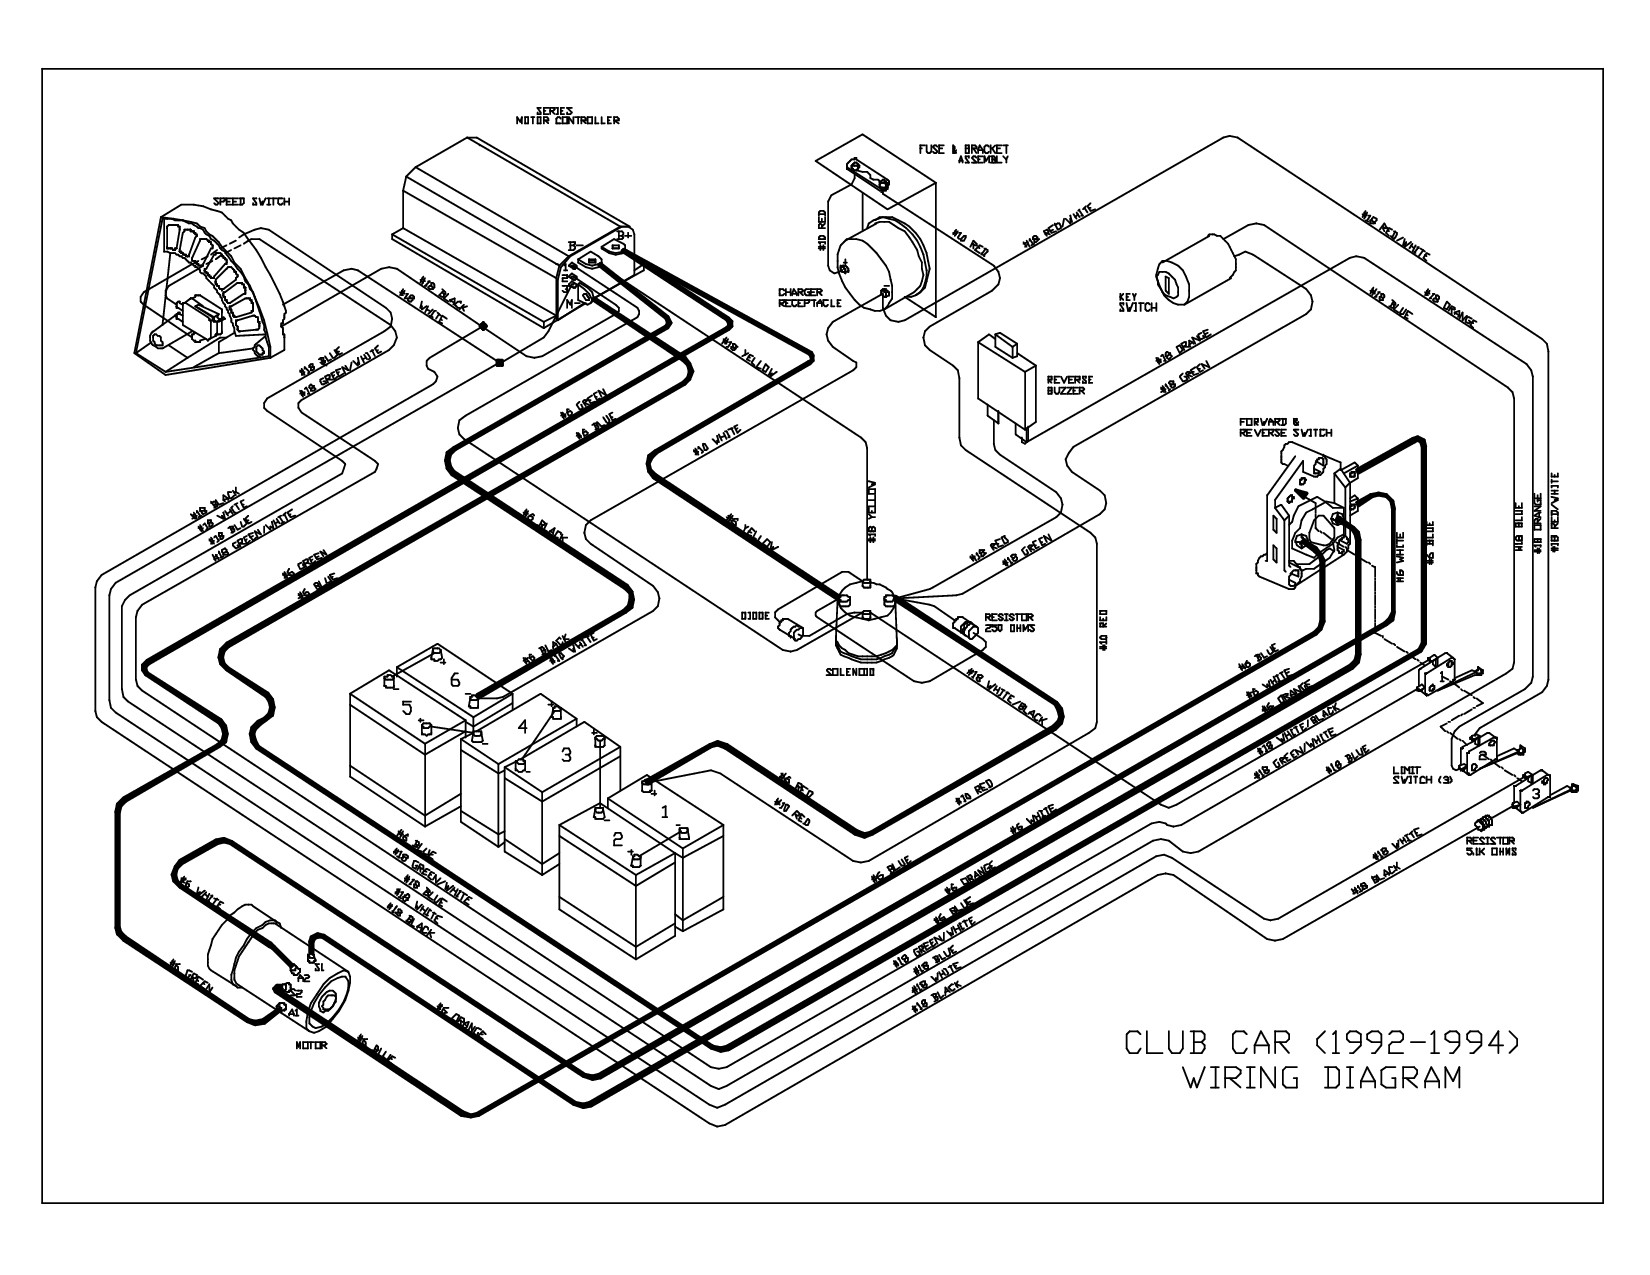 1992 honda accord engine diagram automotive wiring diagram 1992 honda accord wiring diagram speed